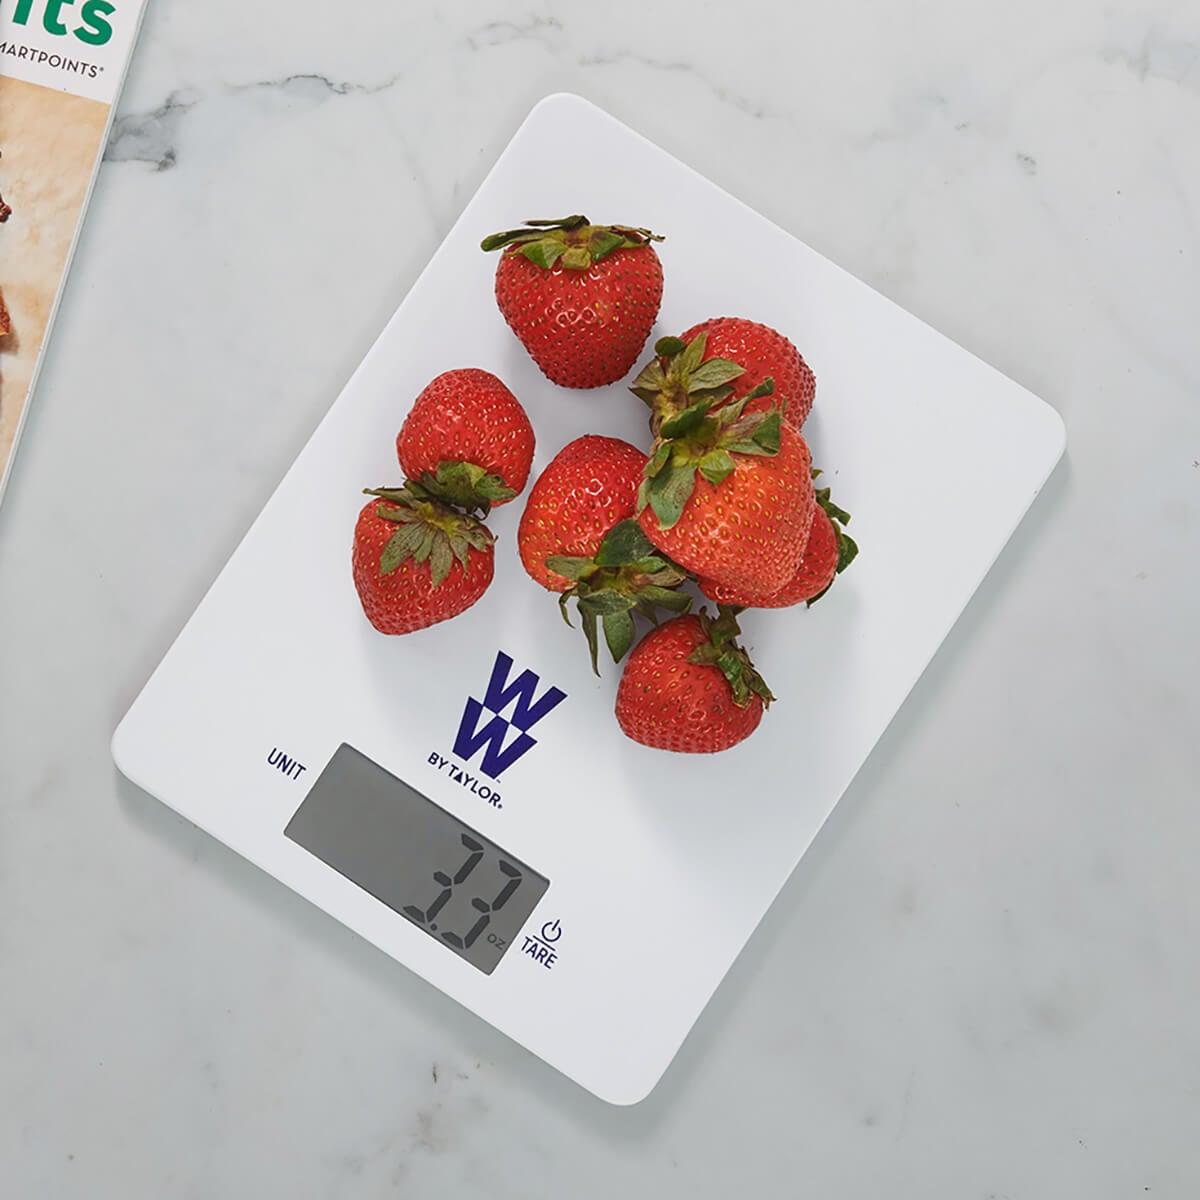 Space Saving Digital Food Scale - lifestyle 3